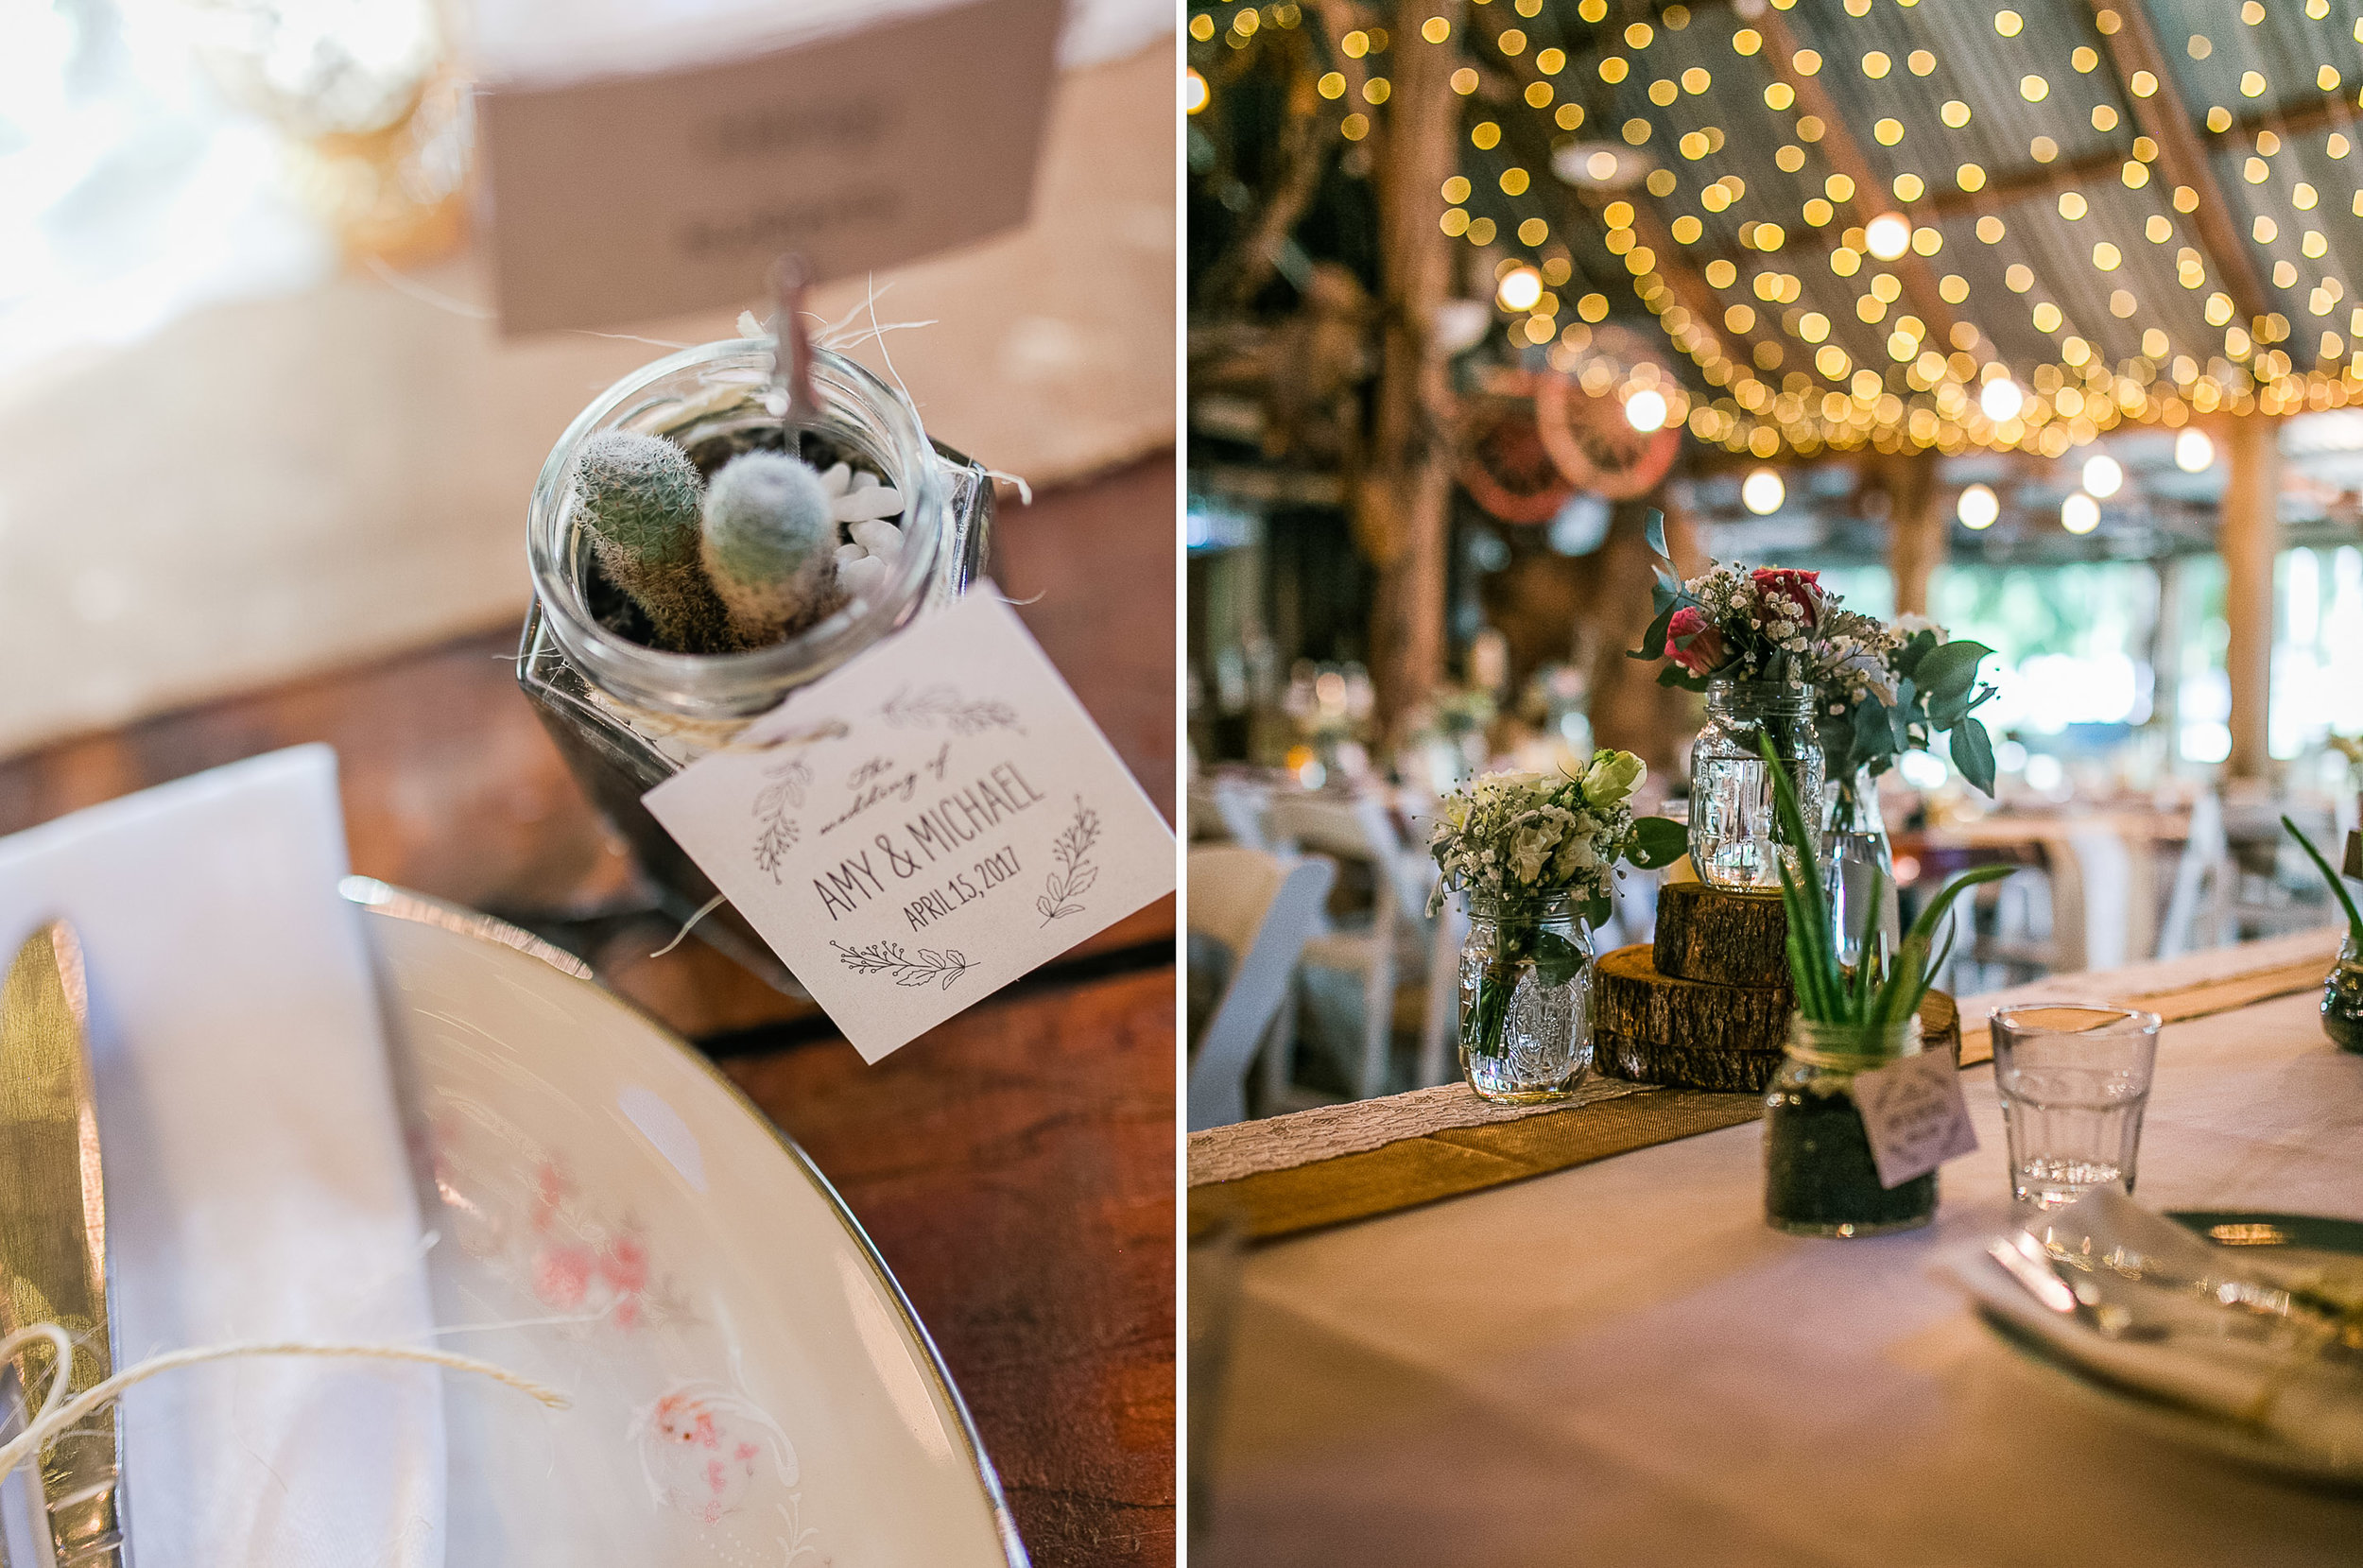 True North Photography_Boomerang Farm_Amy and Michael_Getting ready_Wedding Dress_Gold Coast Wedding_ Table Styling 3_Barn wedding.jpg